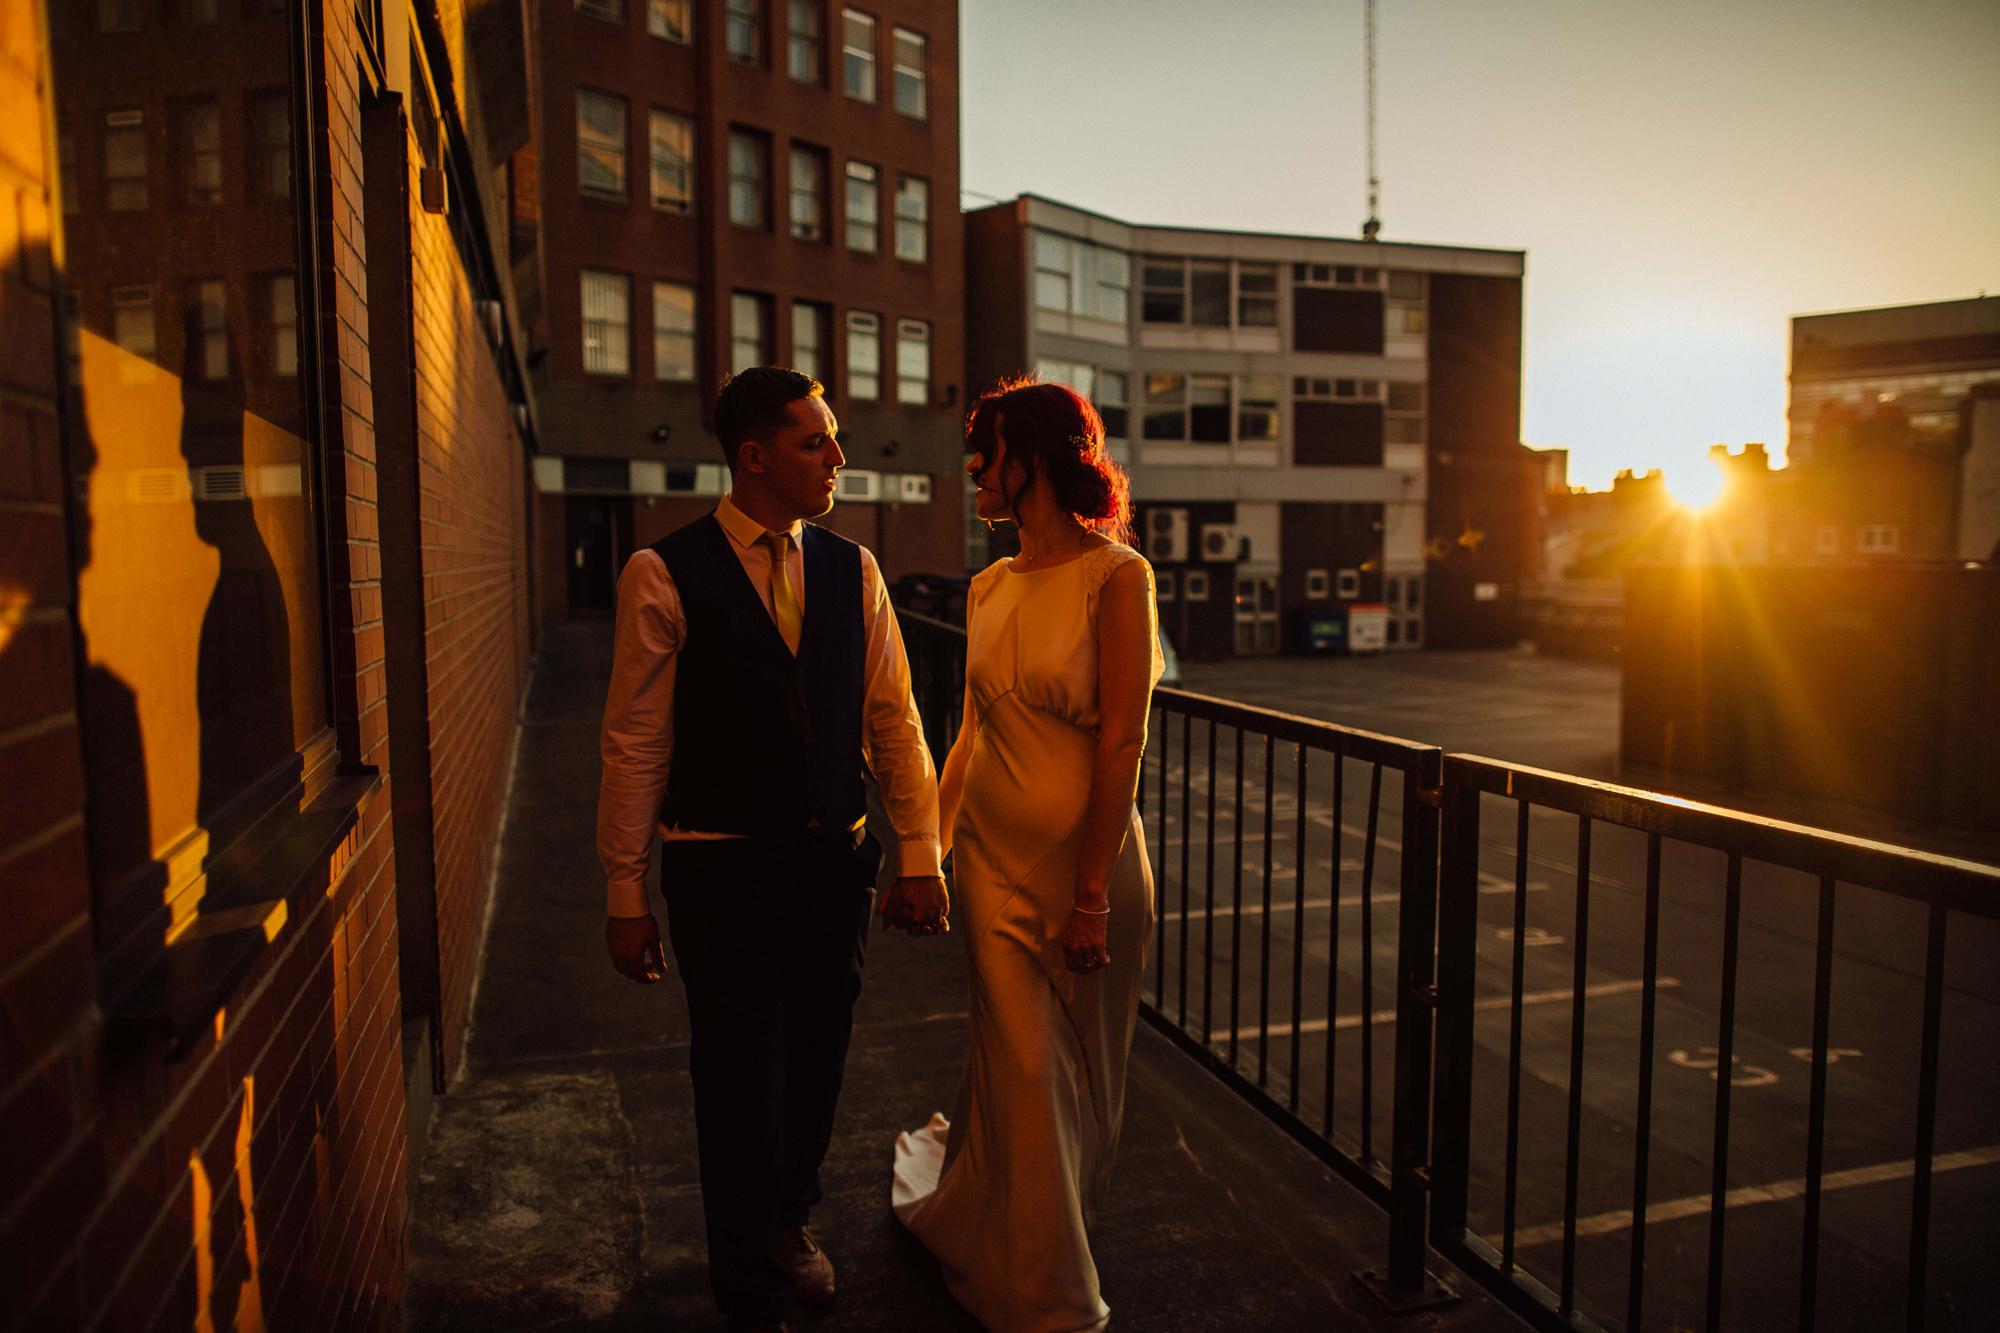 Sarah-Honeysuckle-Bias-Cut-Silk-Vintage-Inspired-Wedding-Gown-Sheffield-Wedding-Kate-Beaumont-65.jpg